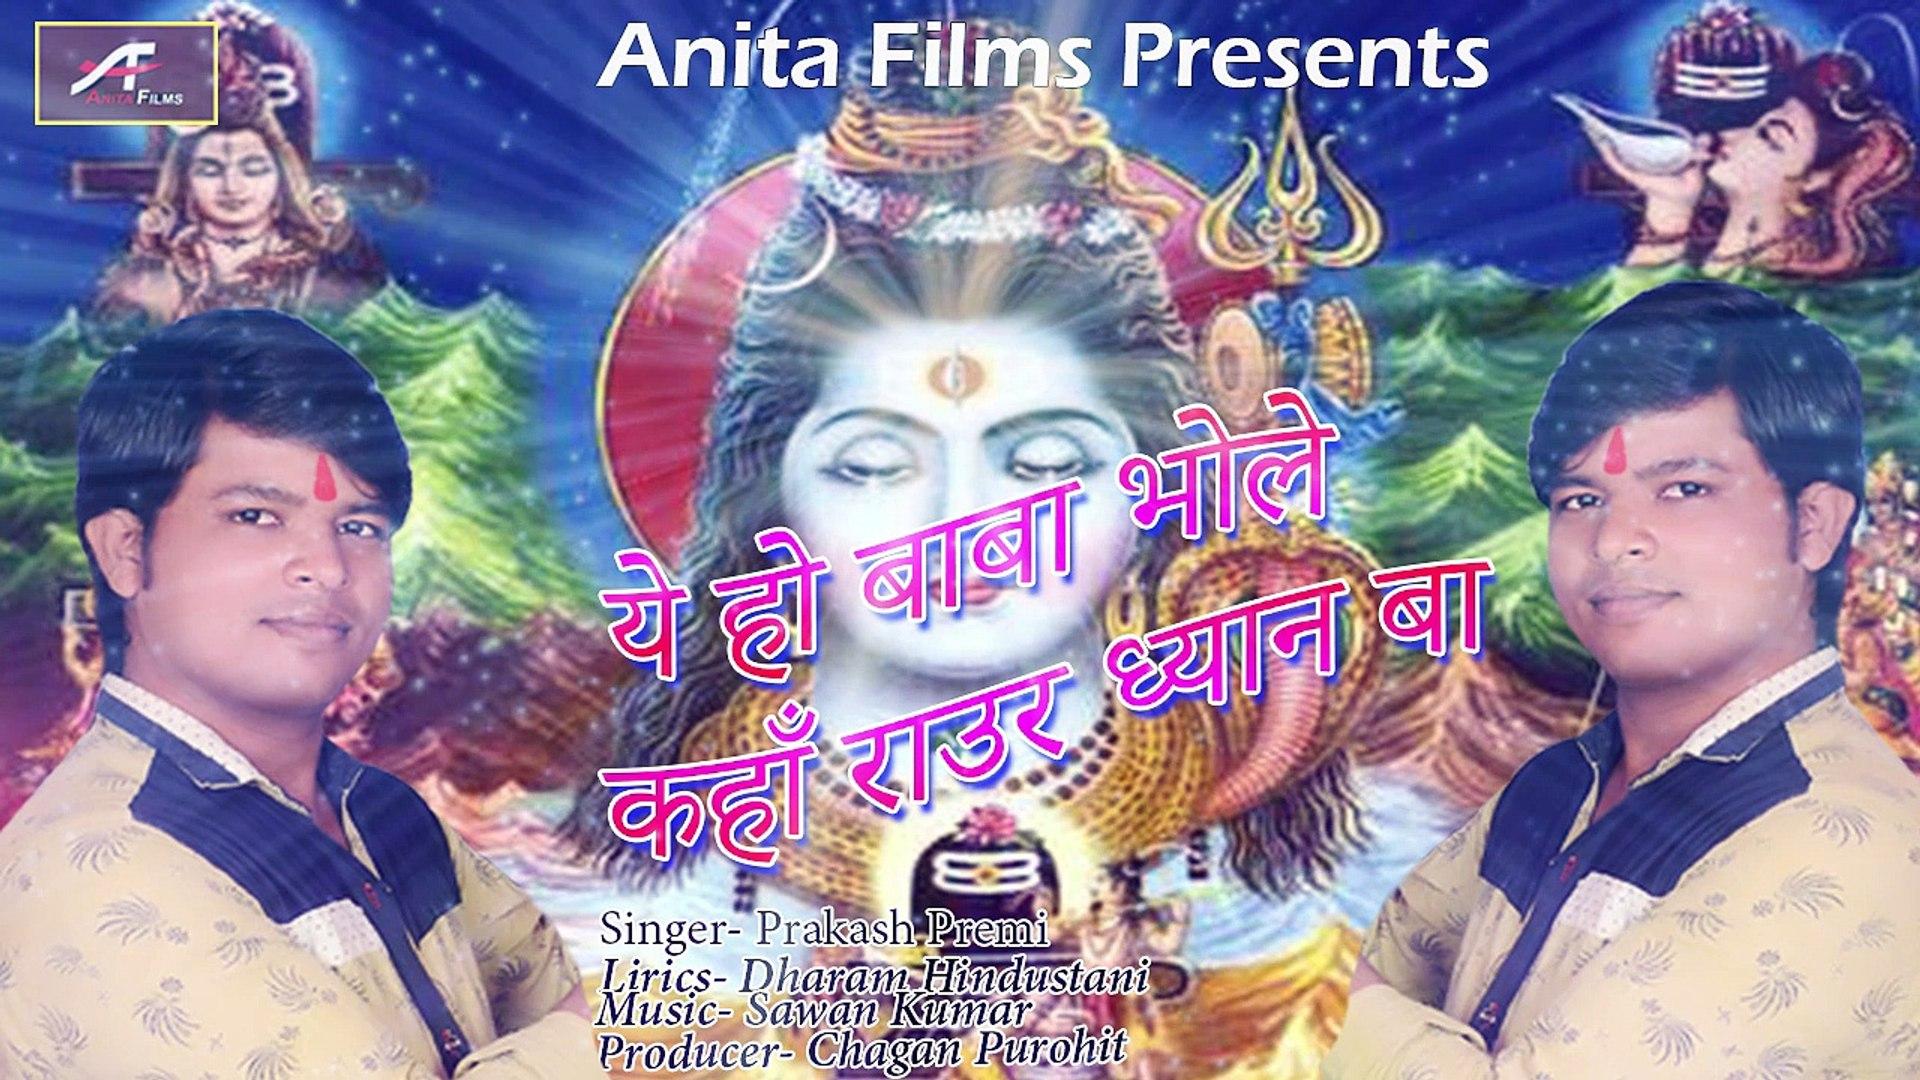 Bhojpuri Kanwar Songs 2017 New ♬ Ye Ho Bhole Baba Kaha Rour Dyan Ba ♬  Prakash Premi ♬ New Shiv Bhajan ♬ Latest Devotional Songs ♬ Full Audio Song    Mp3 Songs